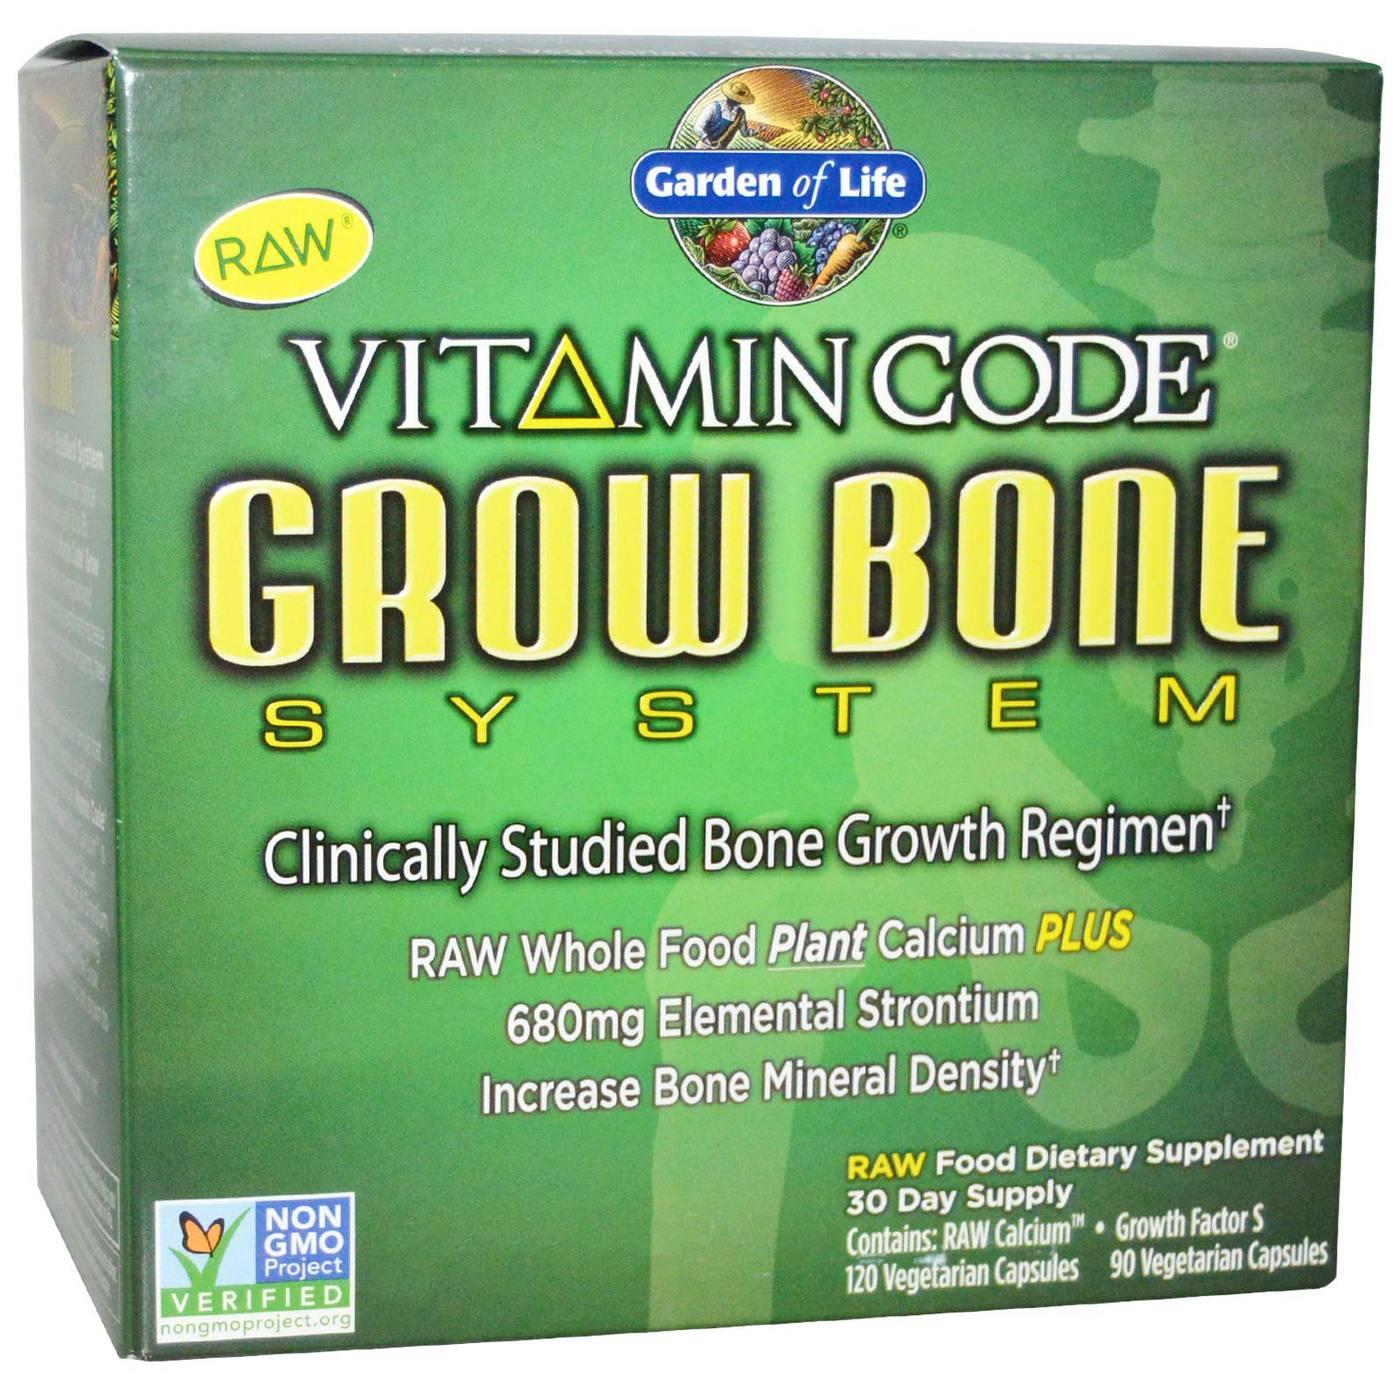 probiotics amazon multivitamin dp code of vitamin with whole garden vegetarian kids life com for chewable food raw supplement